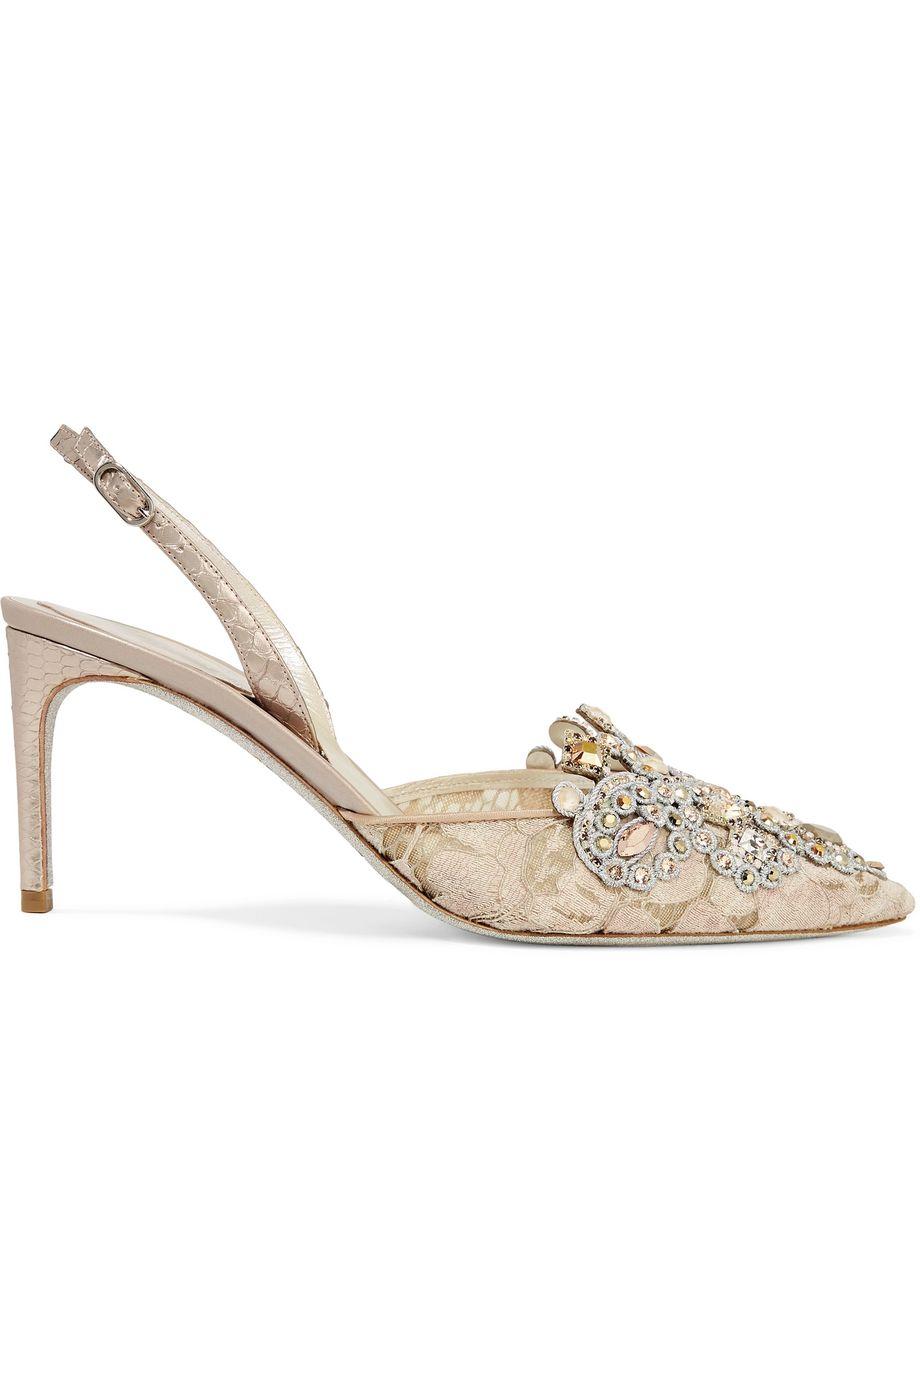 René Caovilla Veneziana 带缀饰蕾丝缎布露跟高跟鞋